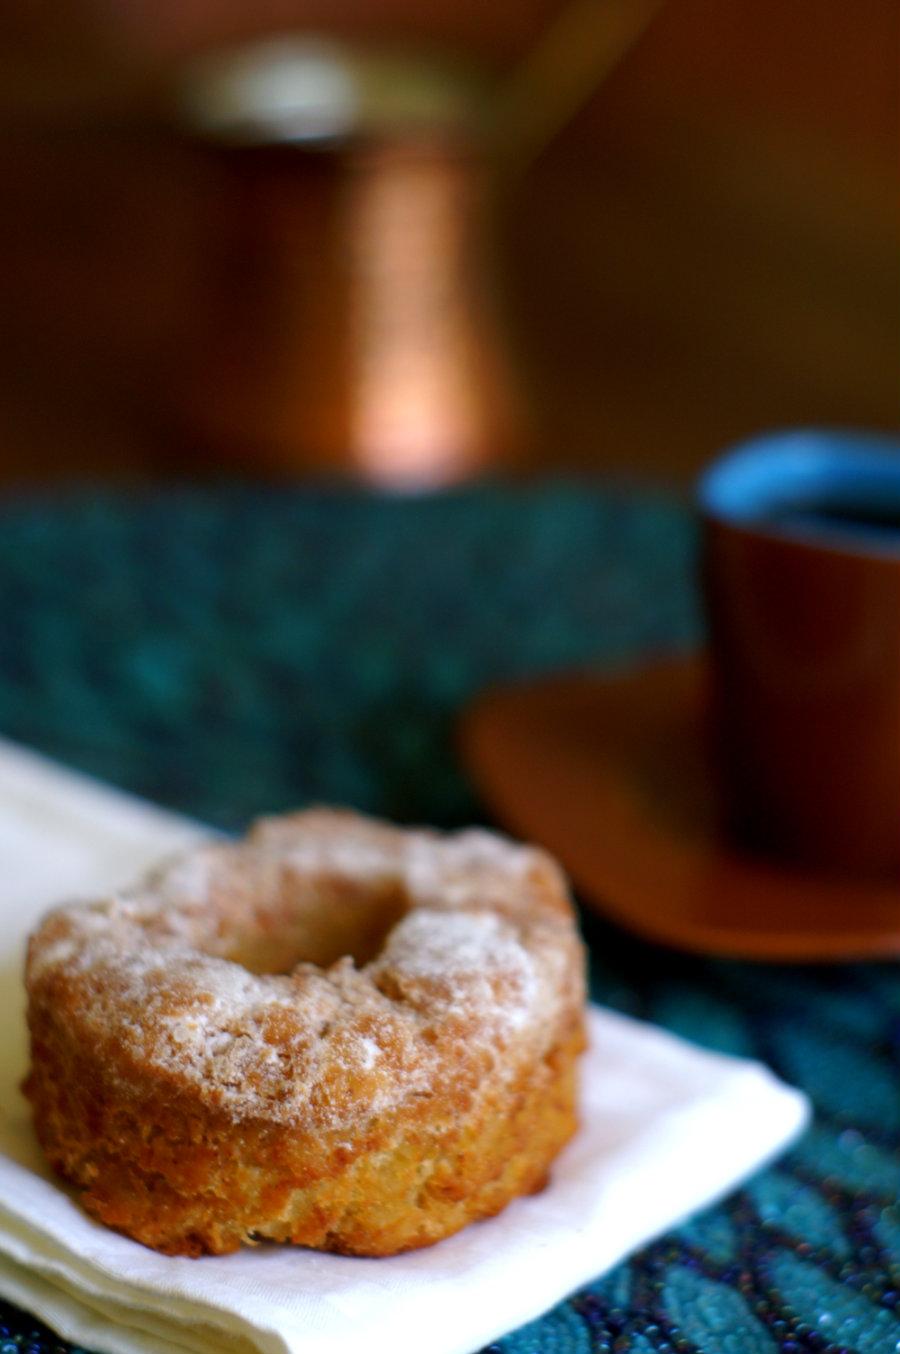 cronut n coffee